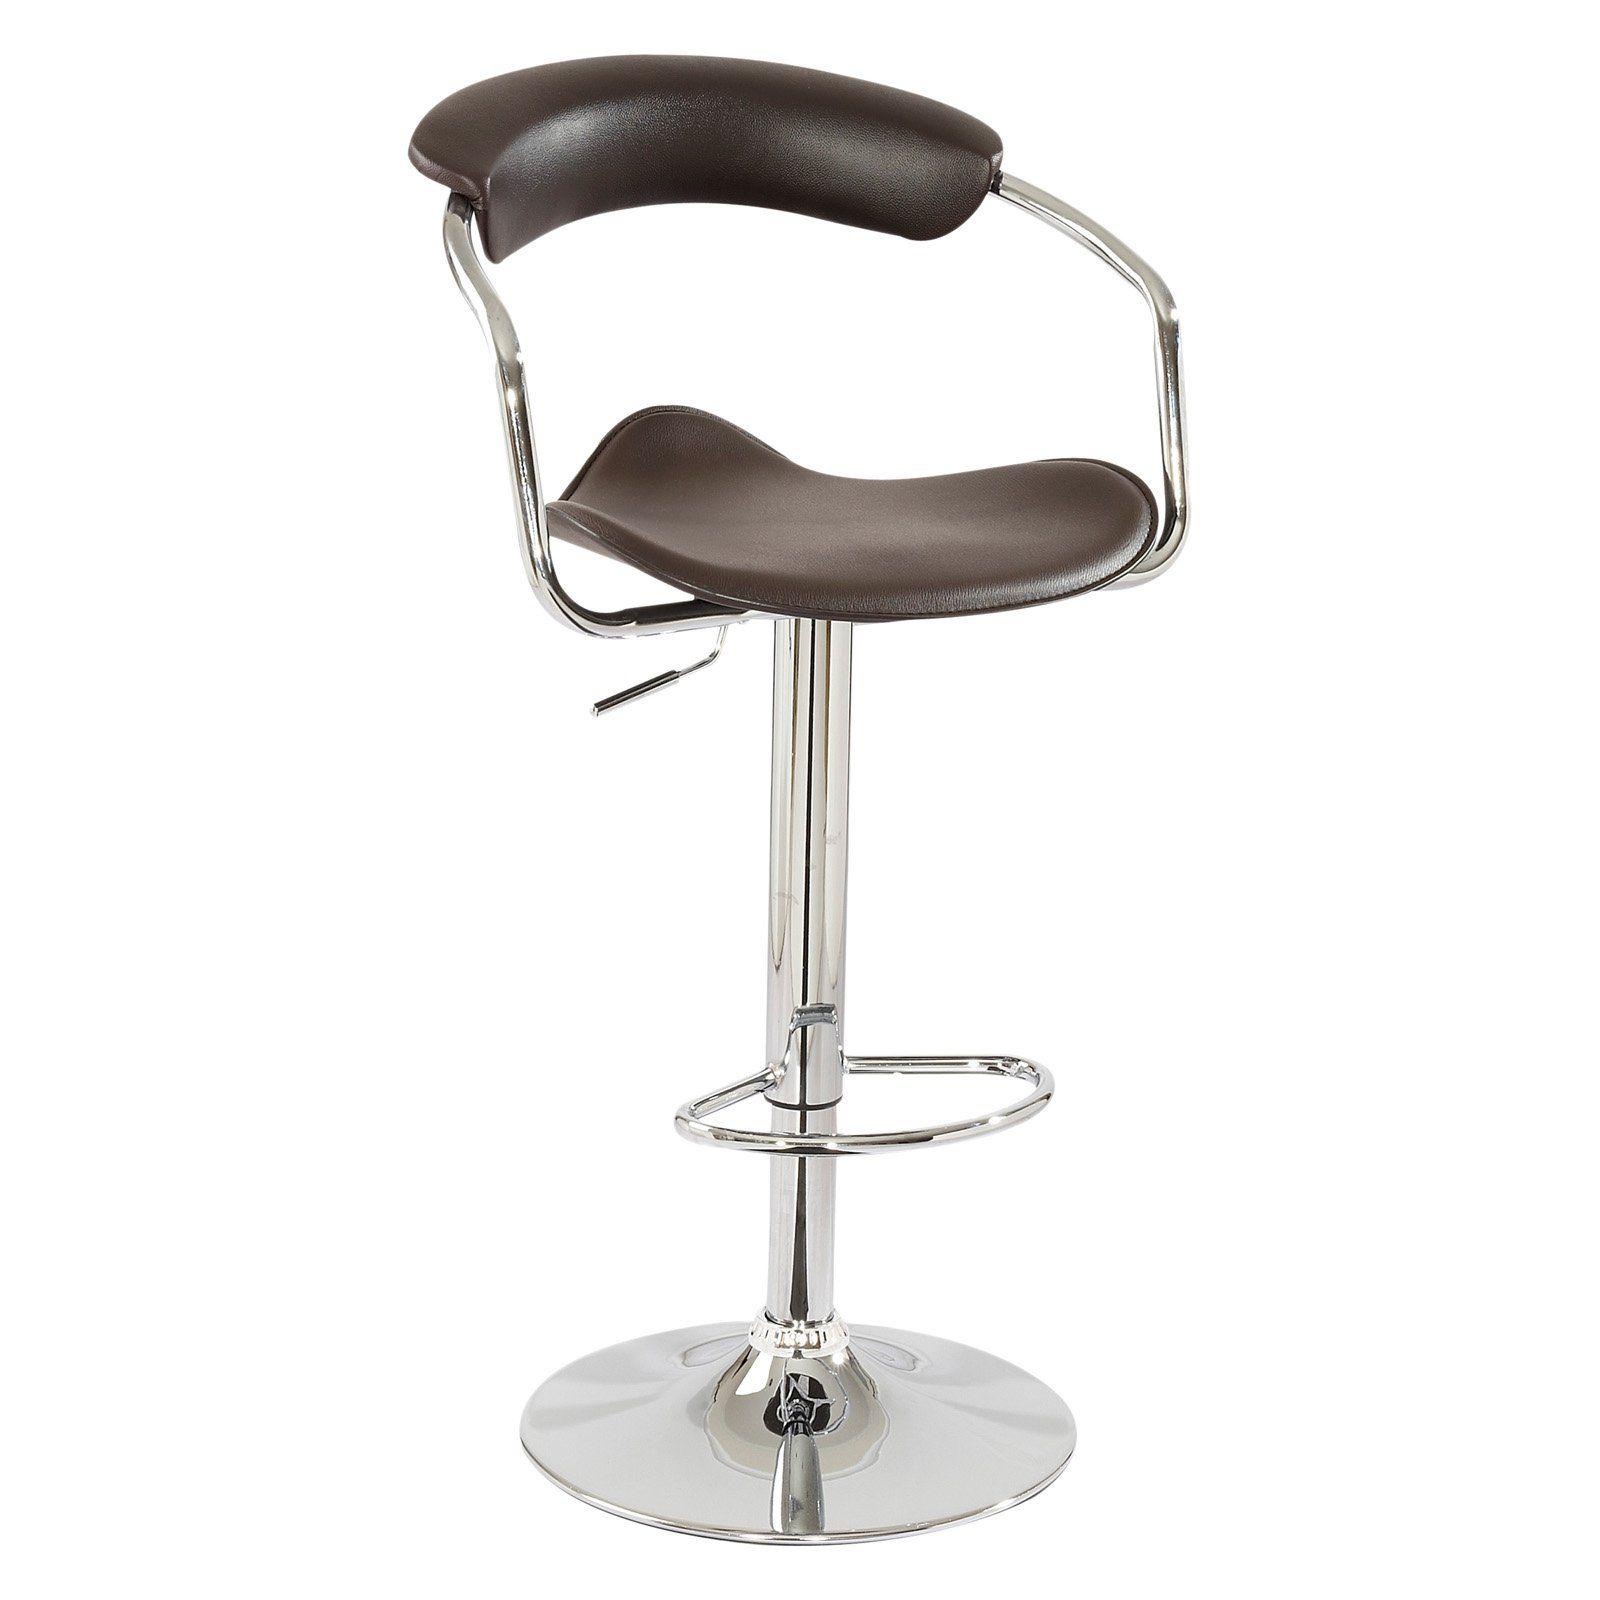 Astounding Best Master Furniture Open Back Vinyl Adjustable Swivel Bar Squirreltailoven Fun Painted Chair Ideas Images Squirreltailovenorg